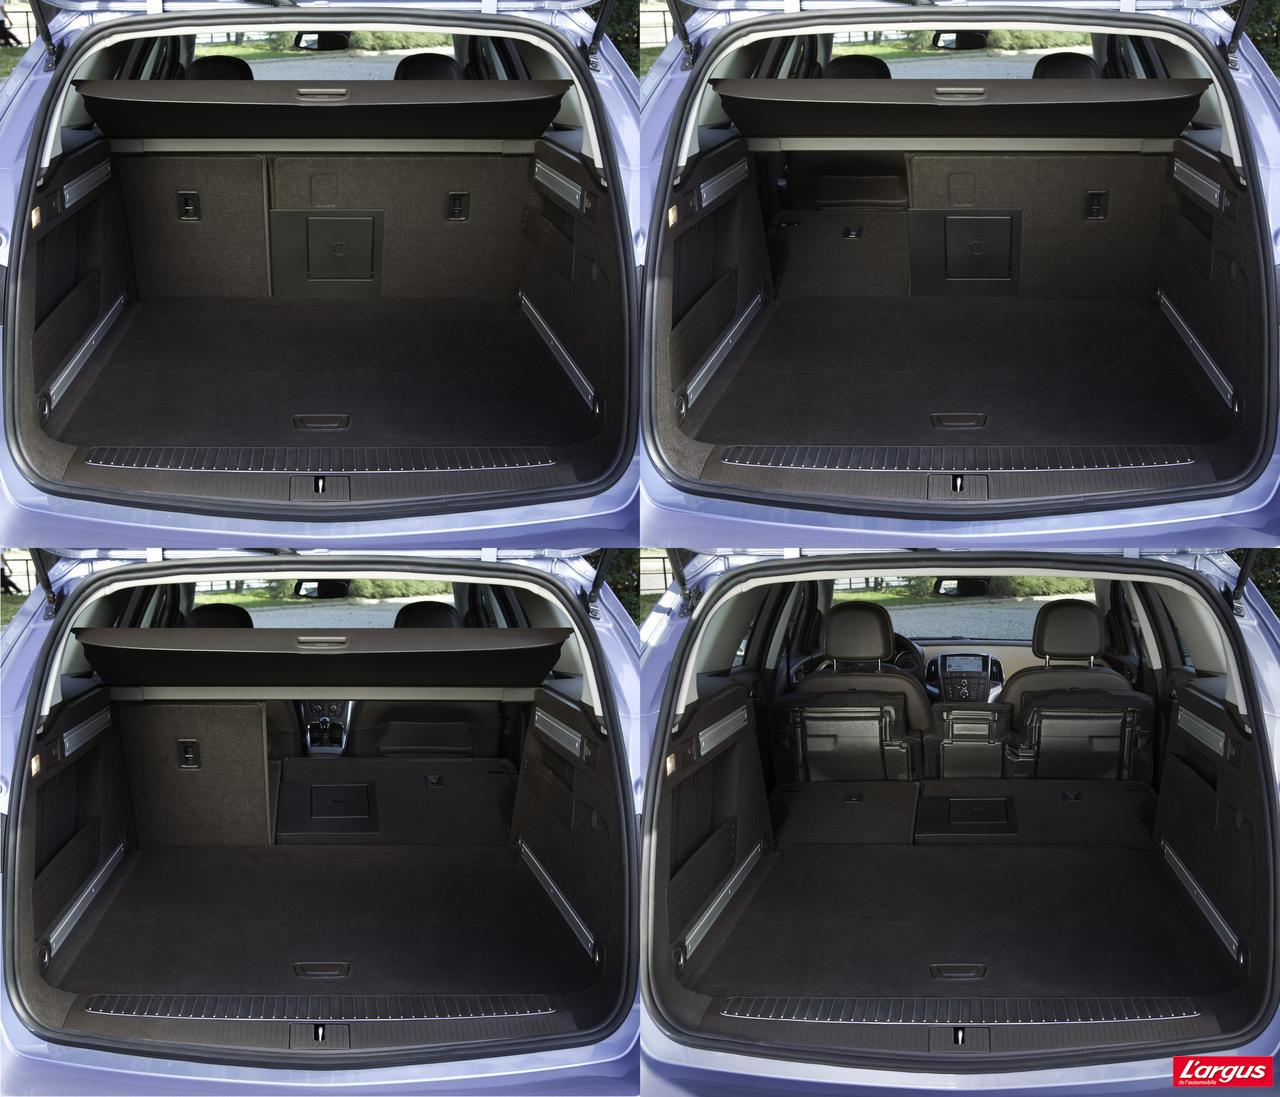 Opel Astra Sport Tourer 2.0 CDTI 160: Plus Sportif Que